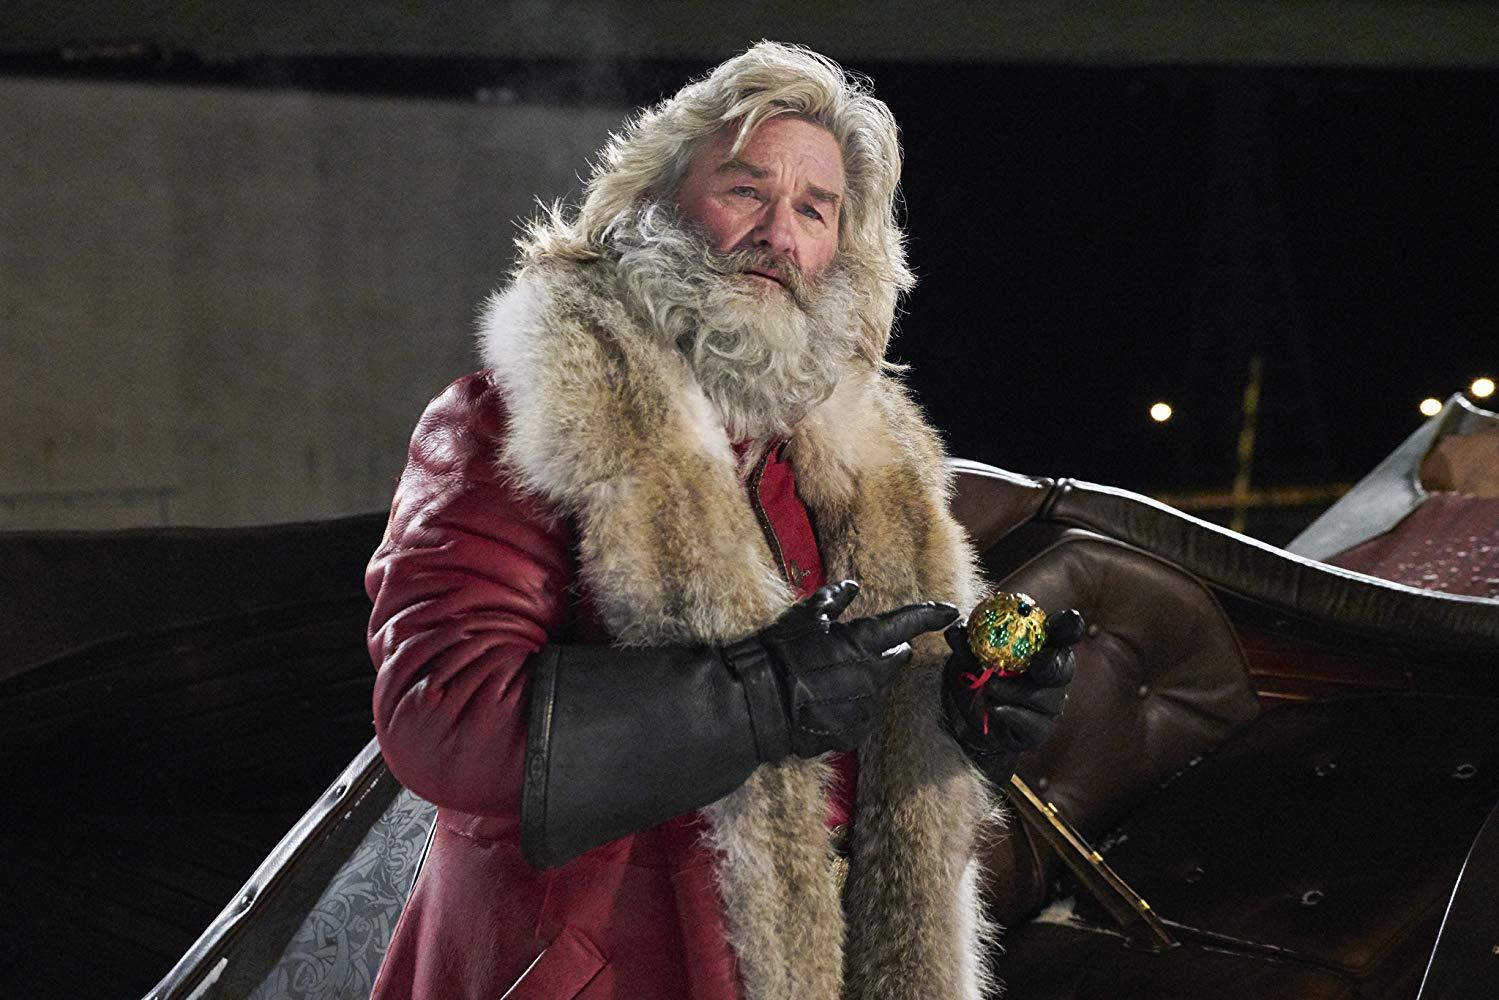 Kurt Russell as Santa Claus